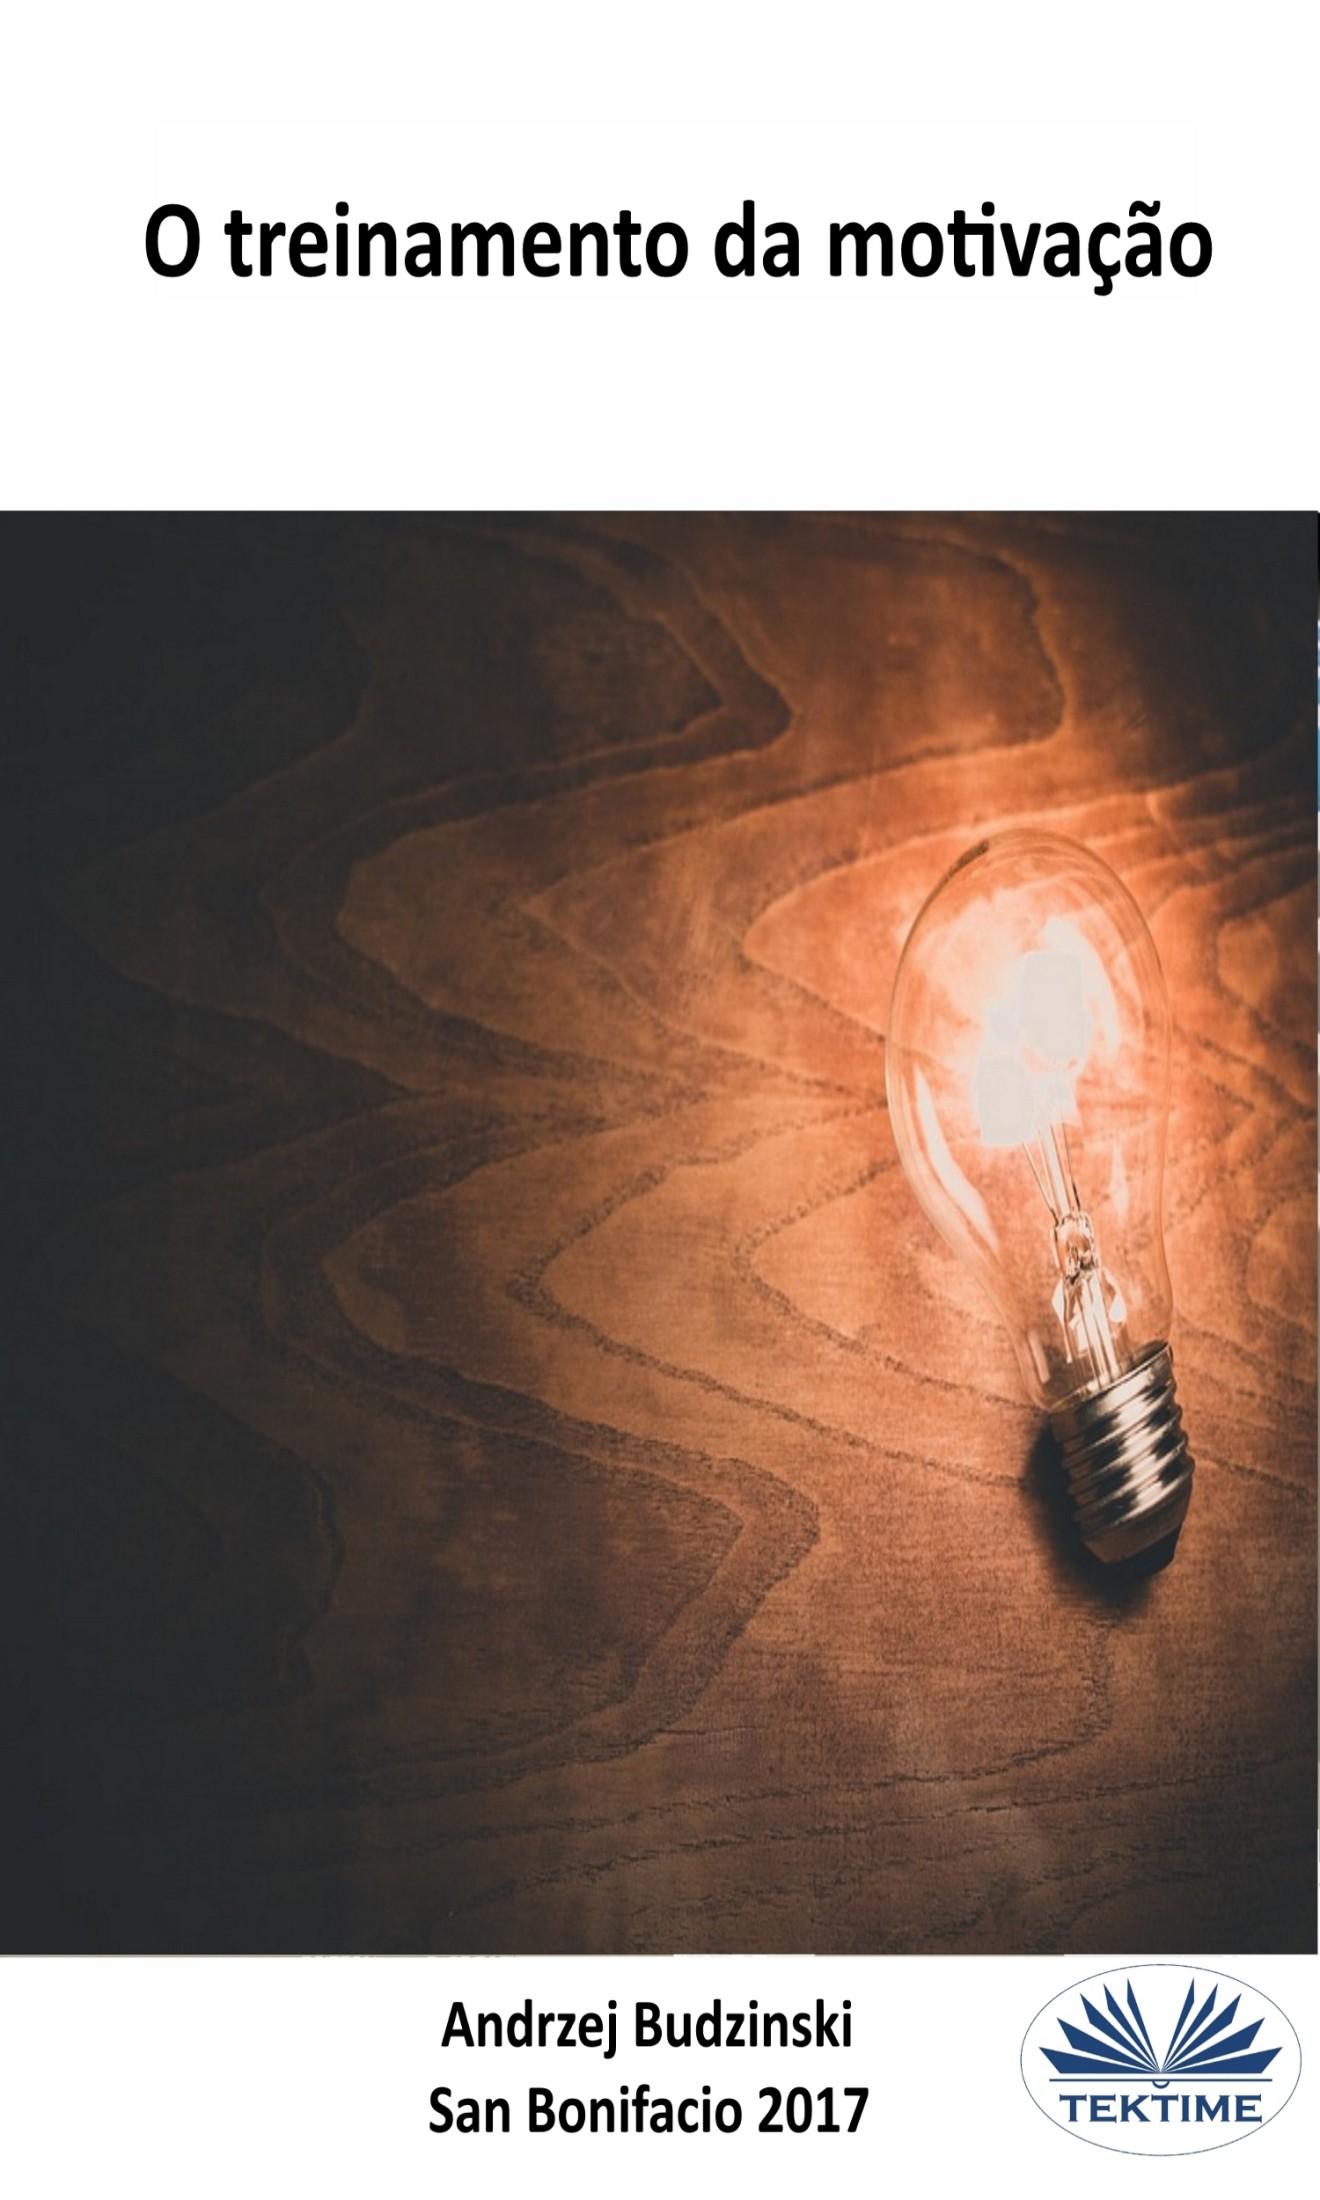 Andrzej Stanislaw Budzinski O Treinamento Da Motivação и а грешилова философские основы педагогической и андрагогической моделей образования isbn 978 5 9765 1778 3